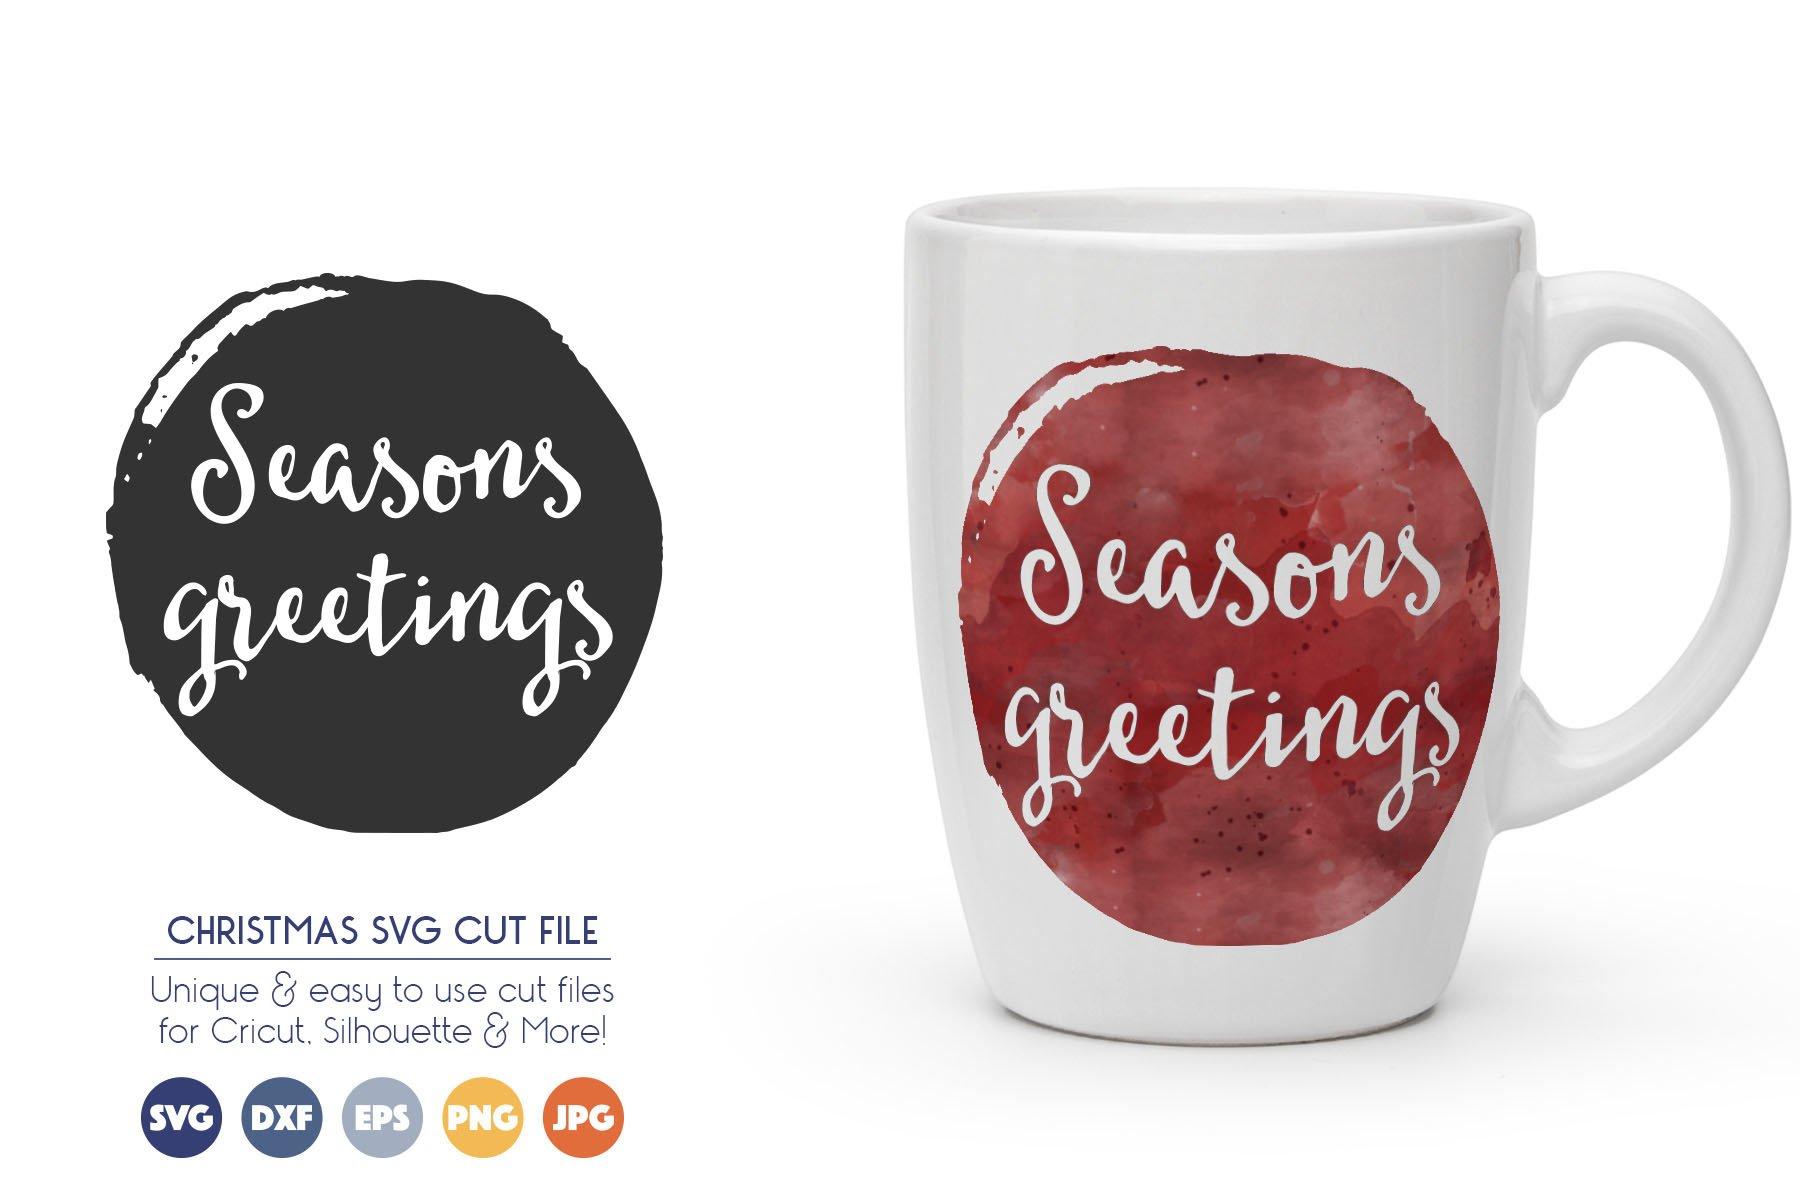 Seasons Greetings - Christmas SVG Cutting Files example image 1